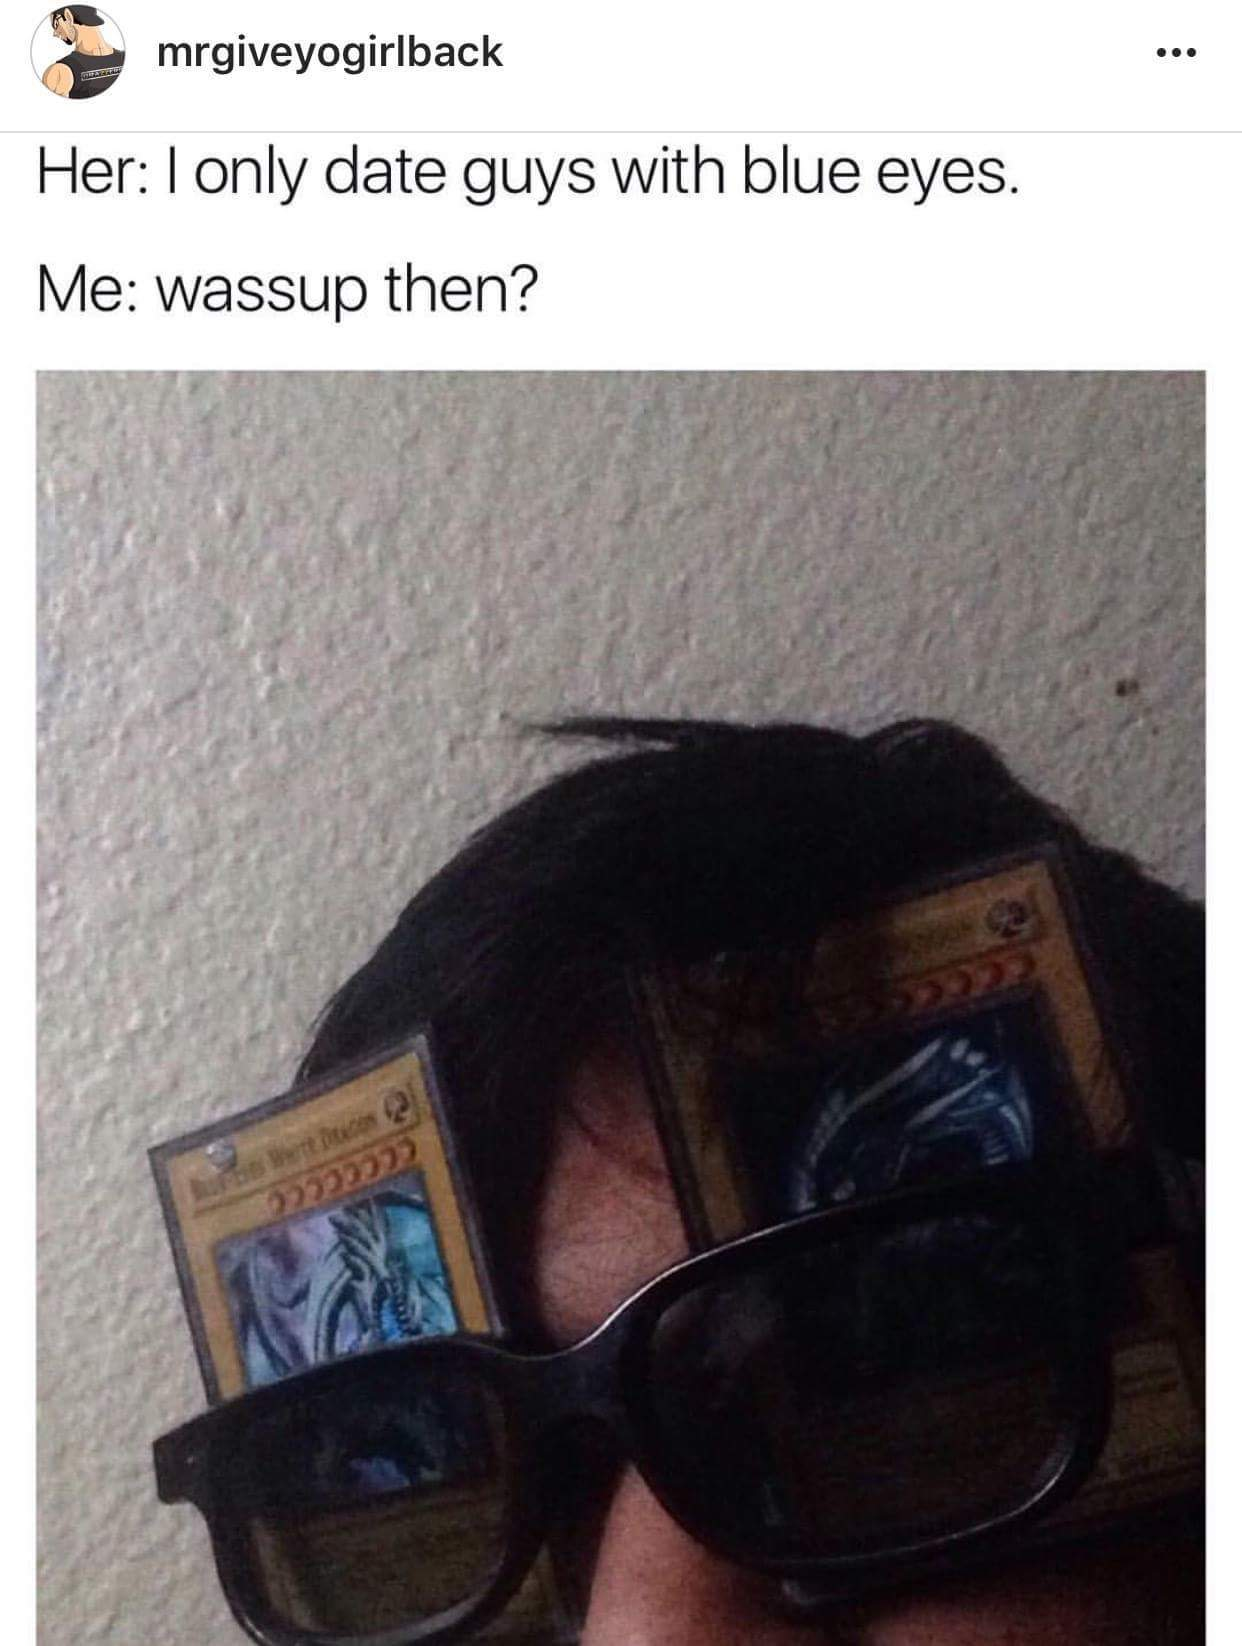 Wassup girl? - meme